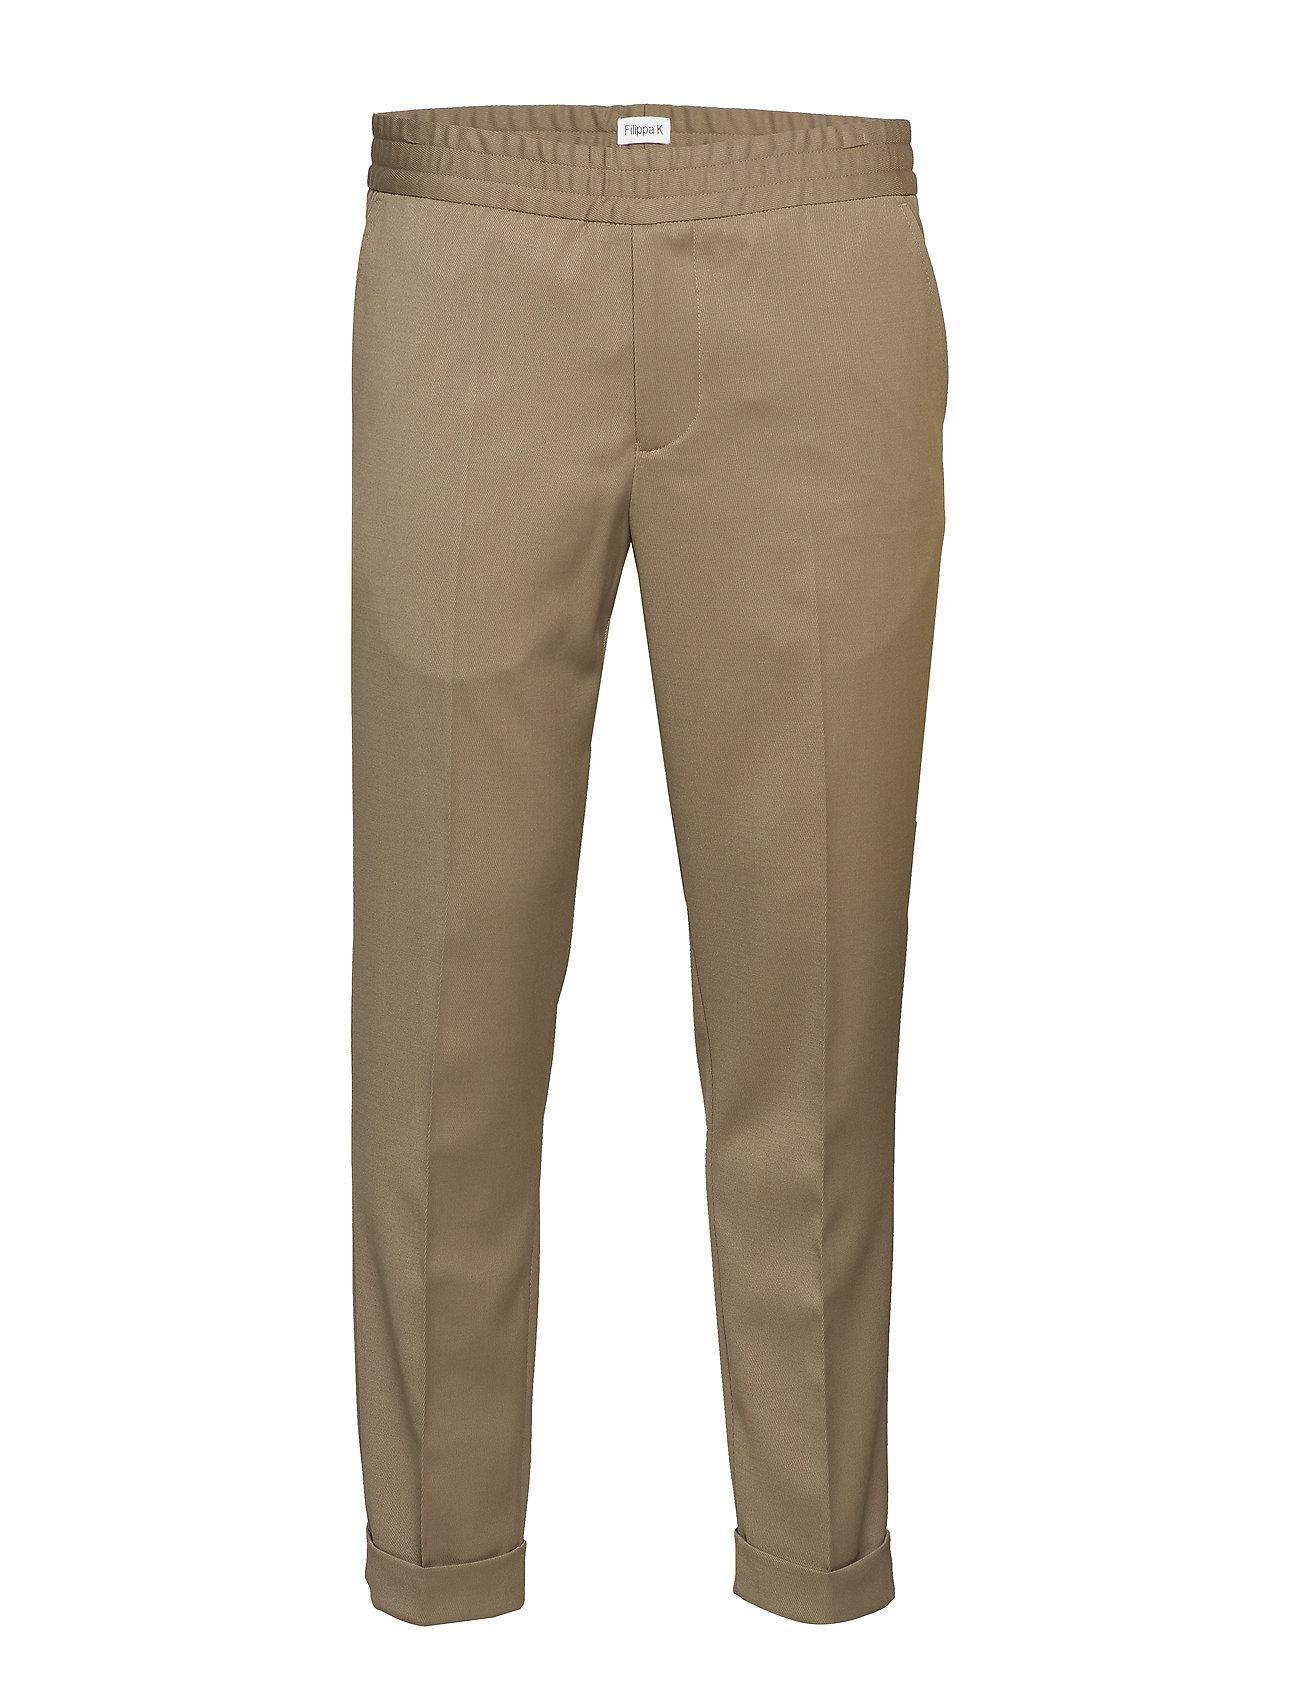 Filippa K M. Terry Gabardine Pants - GREY TAUPE